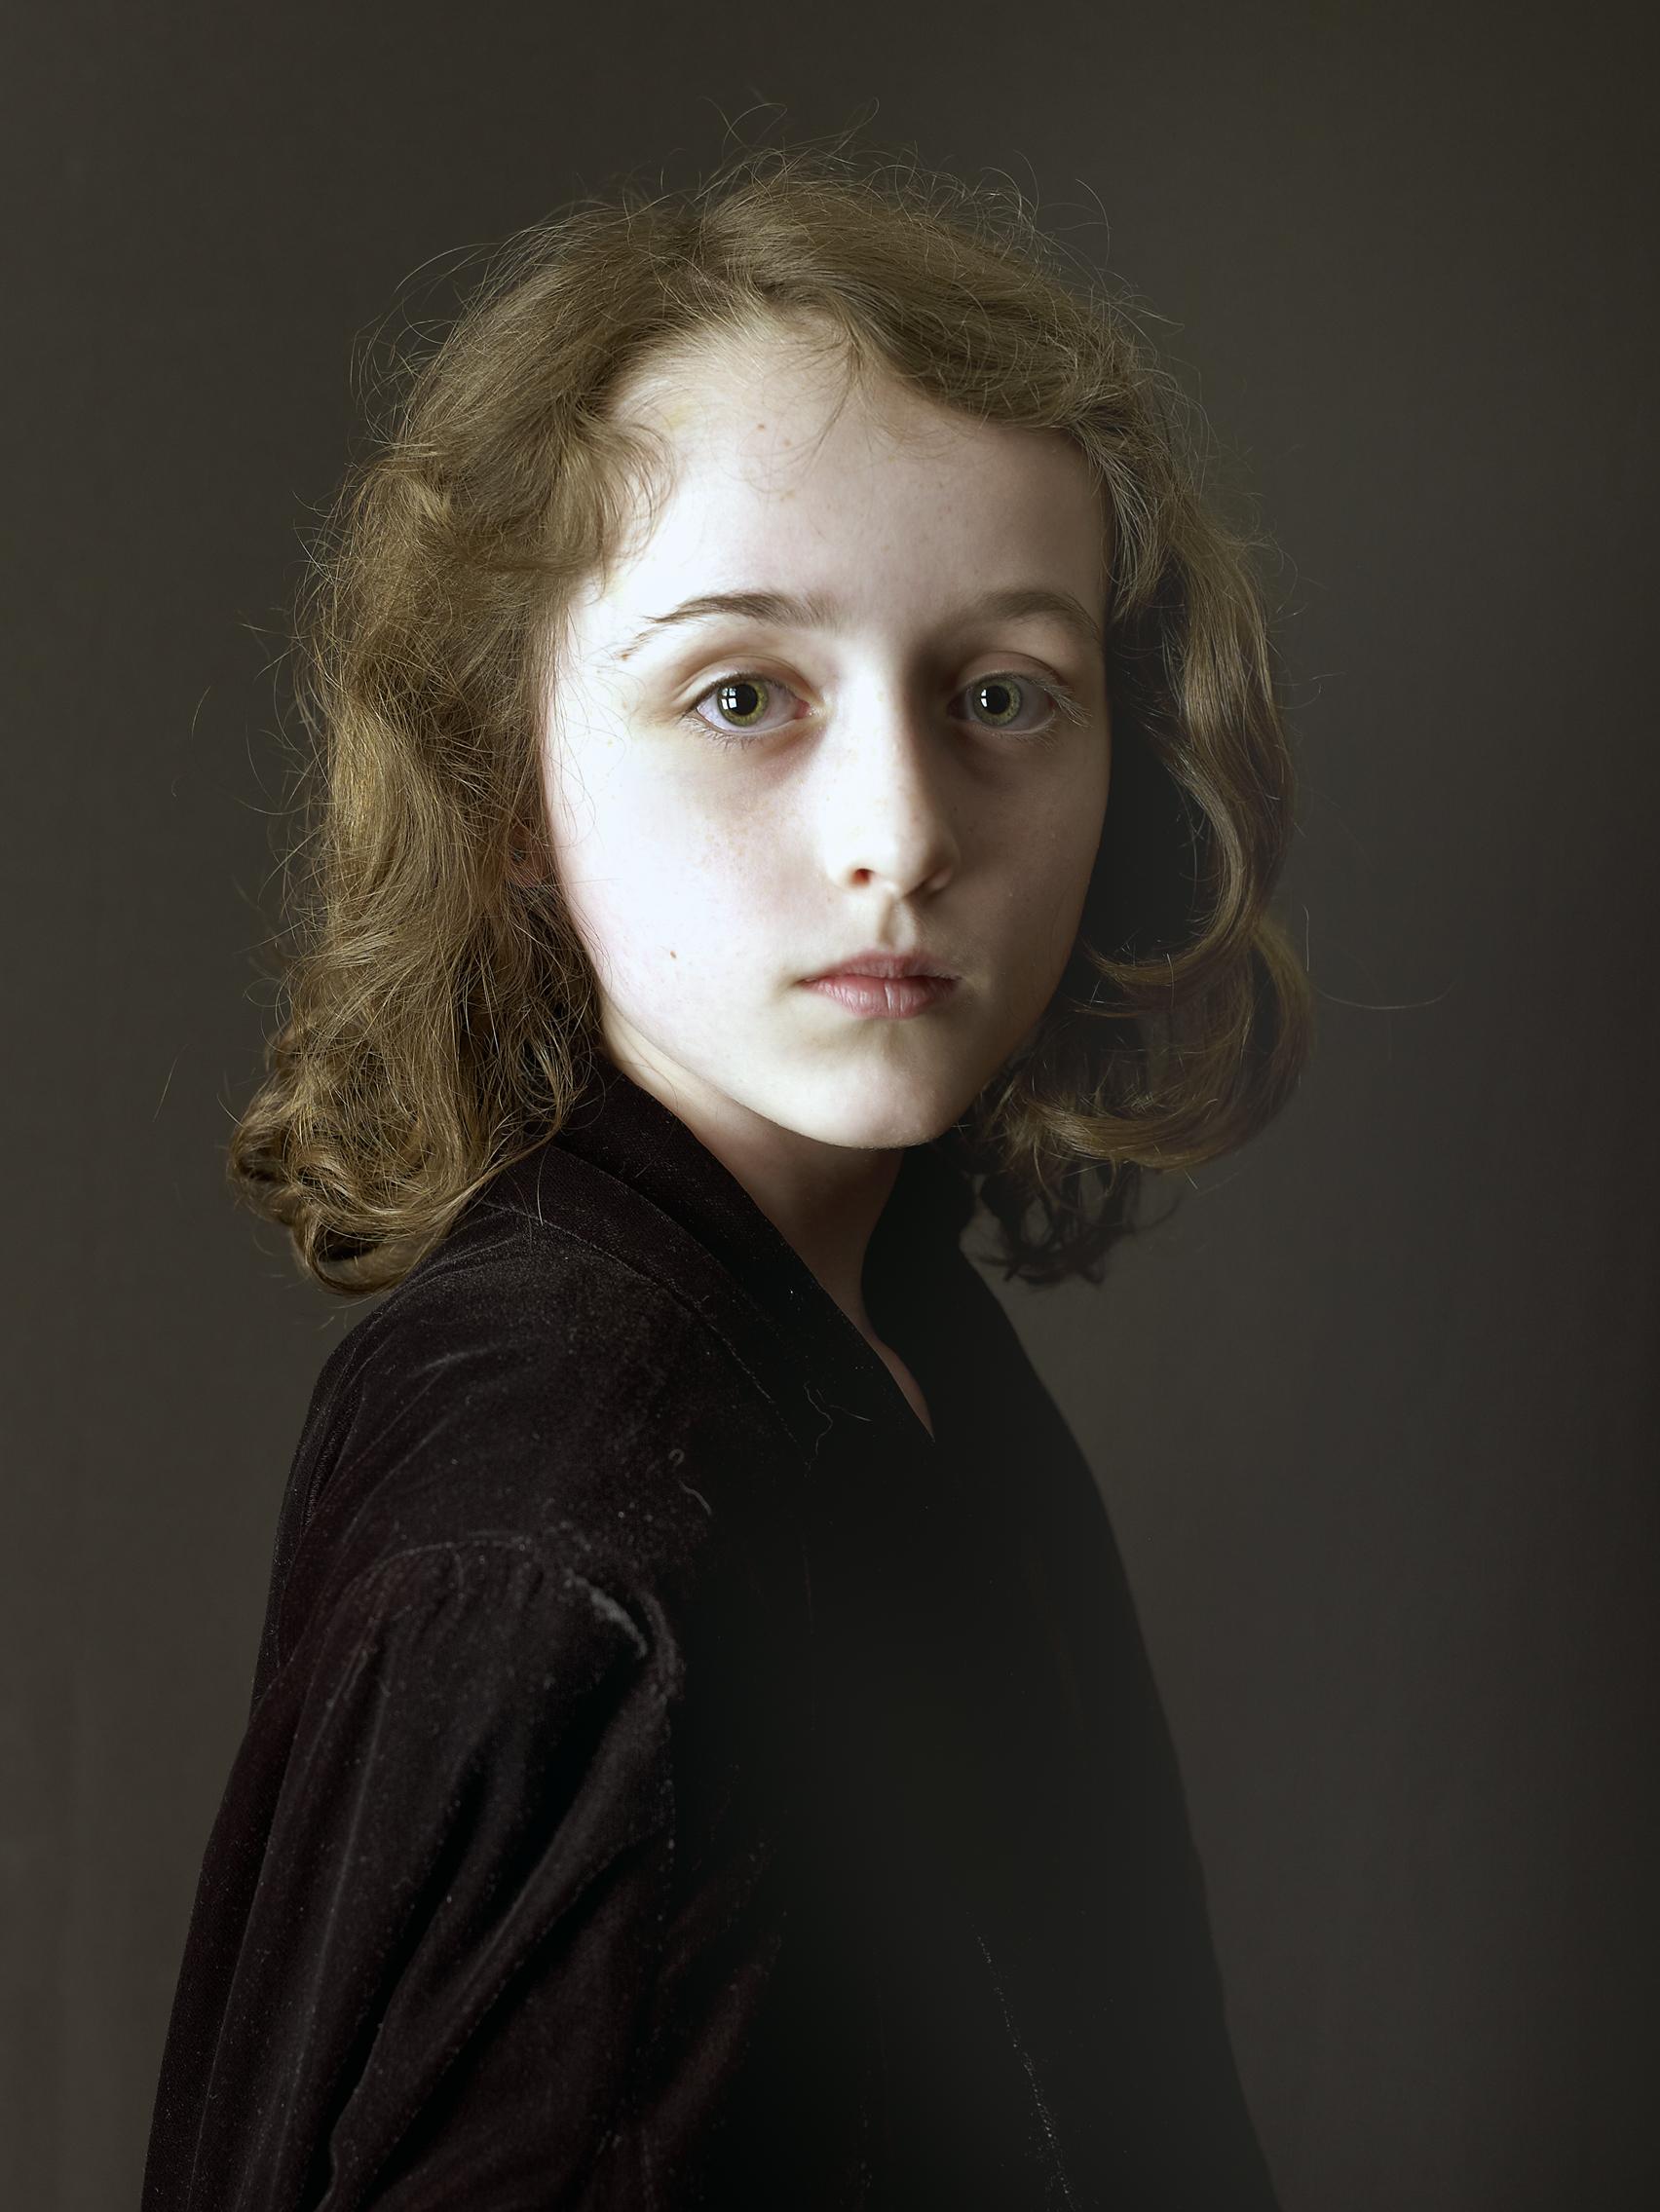 Sophie, 2012 © Pierre Gonnord. Courtesy Galerie Juana de Aizpuru, Madrid